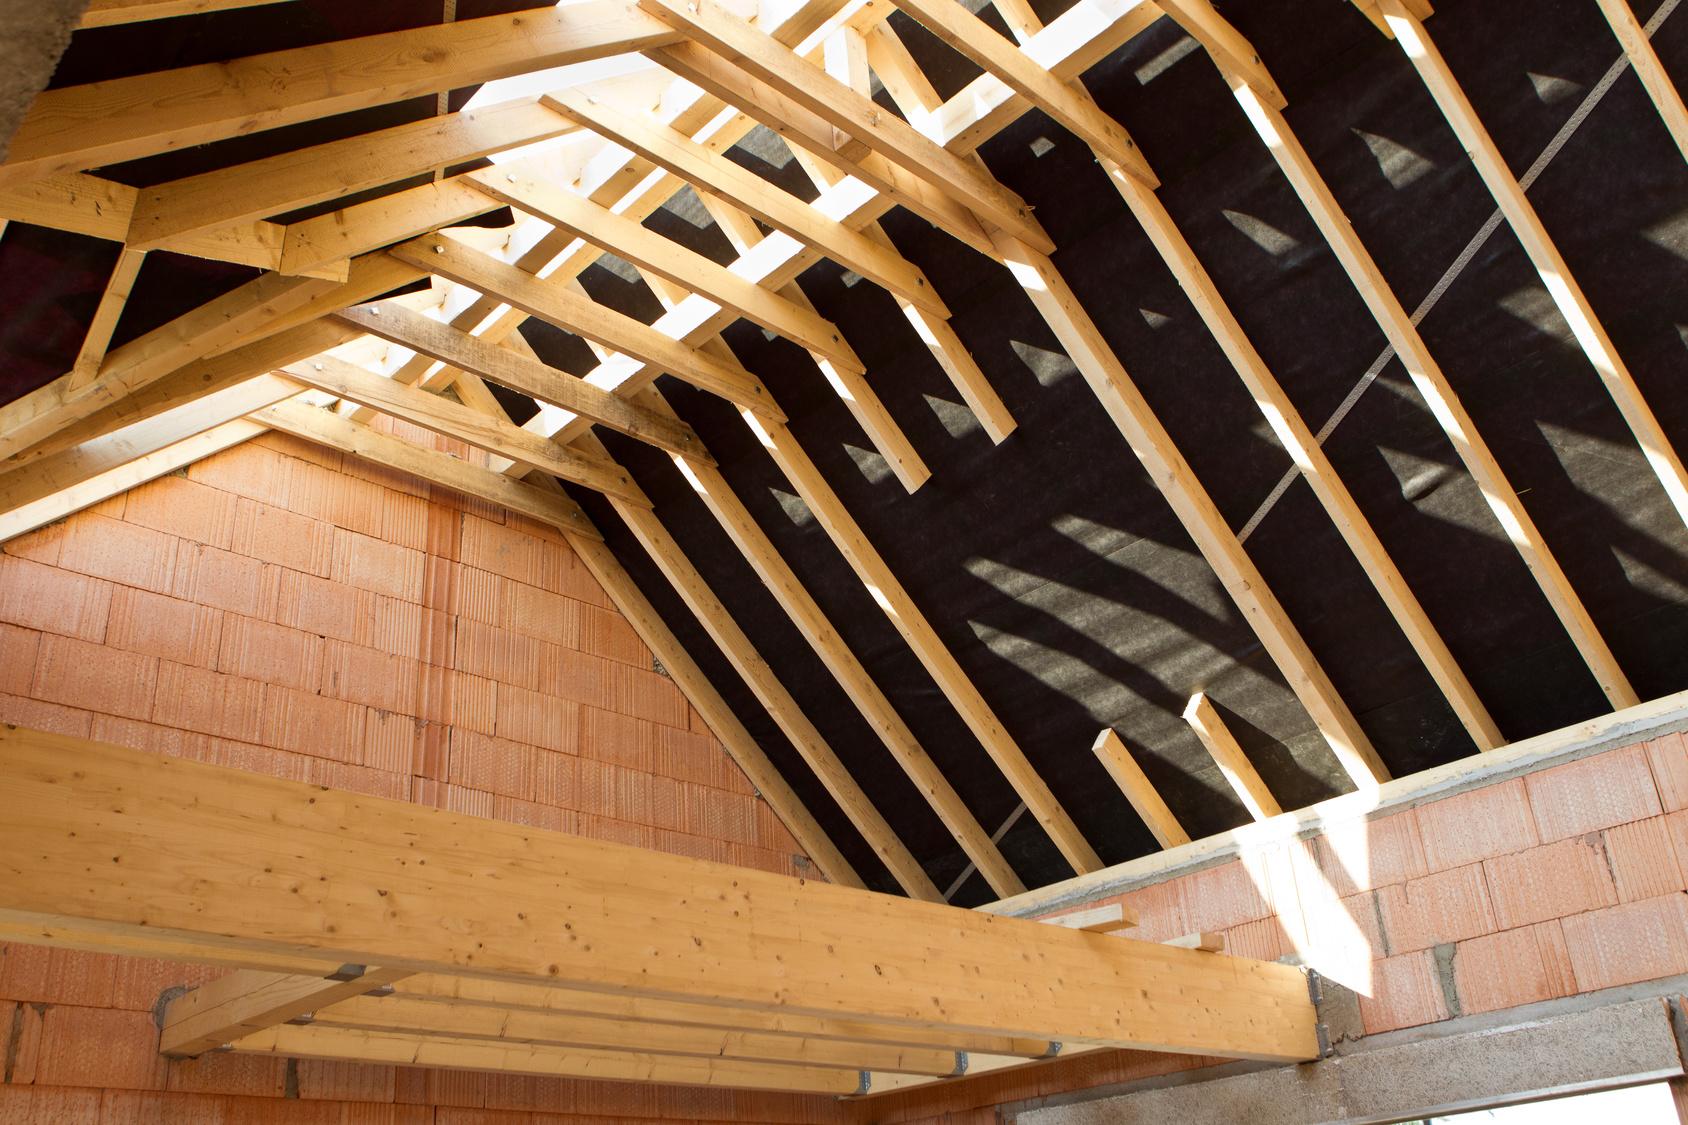 Isoler toiture différentes façons.